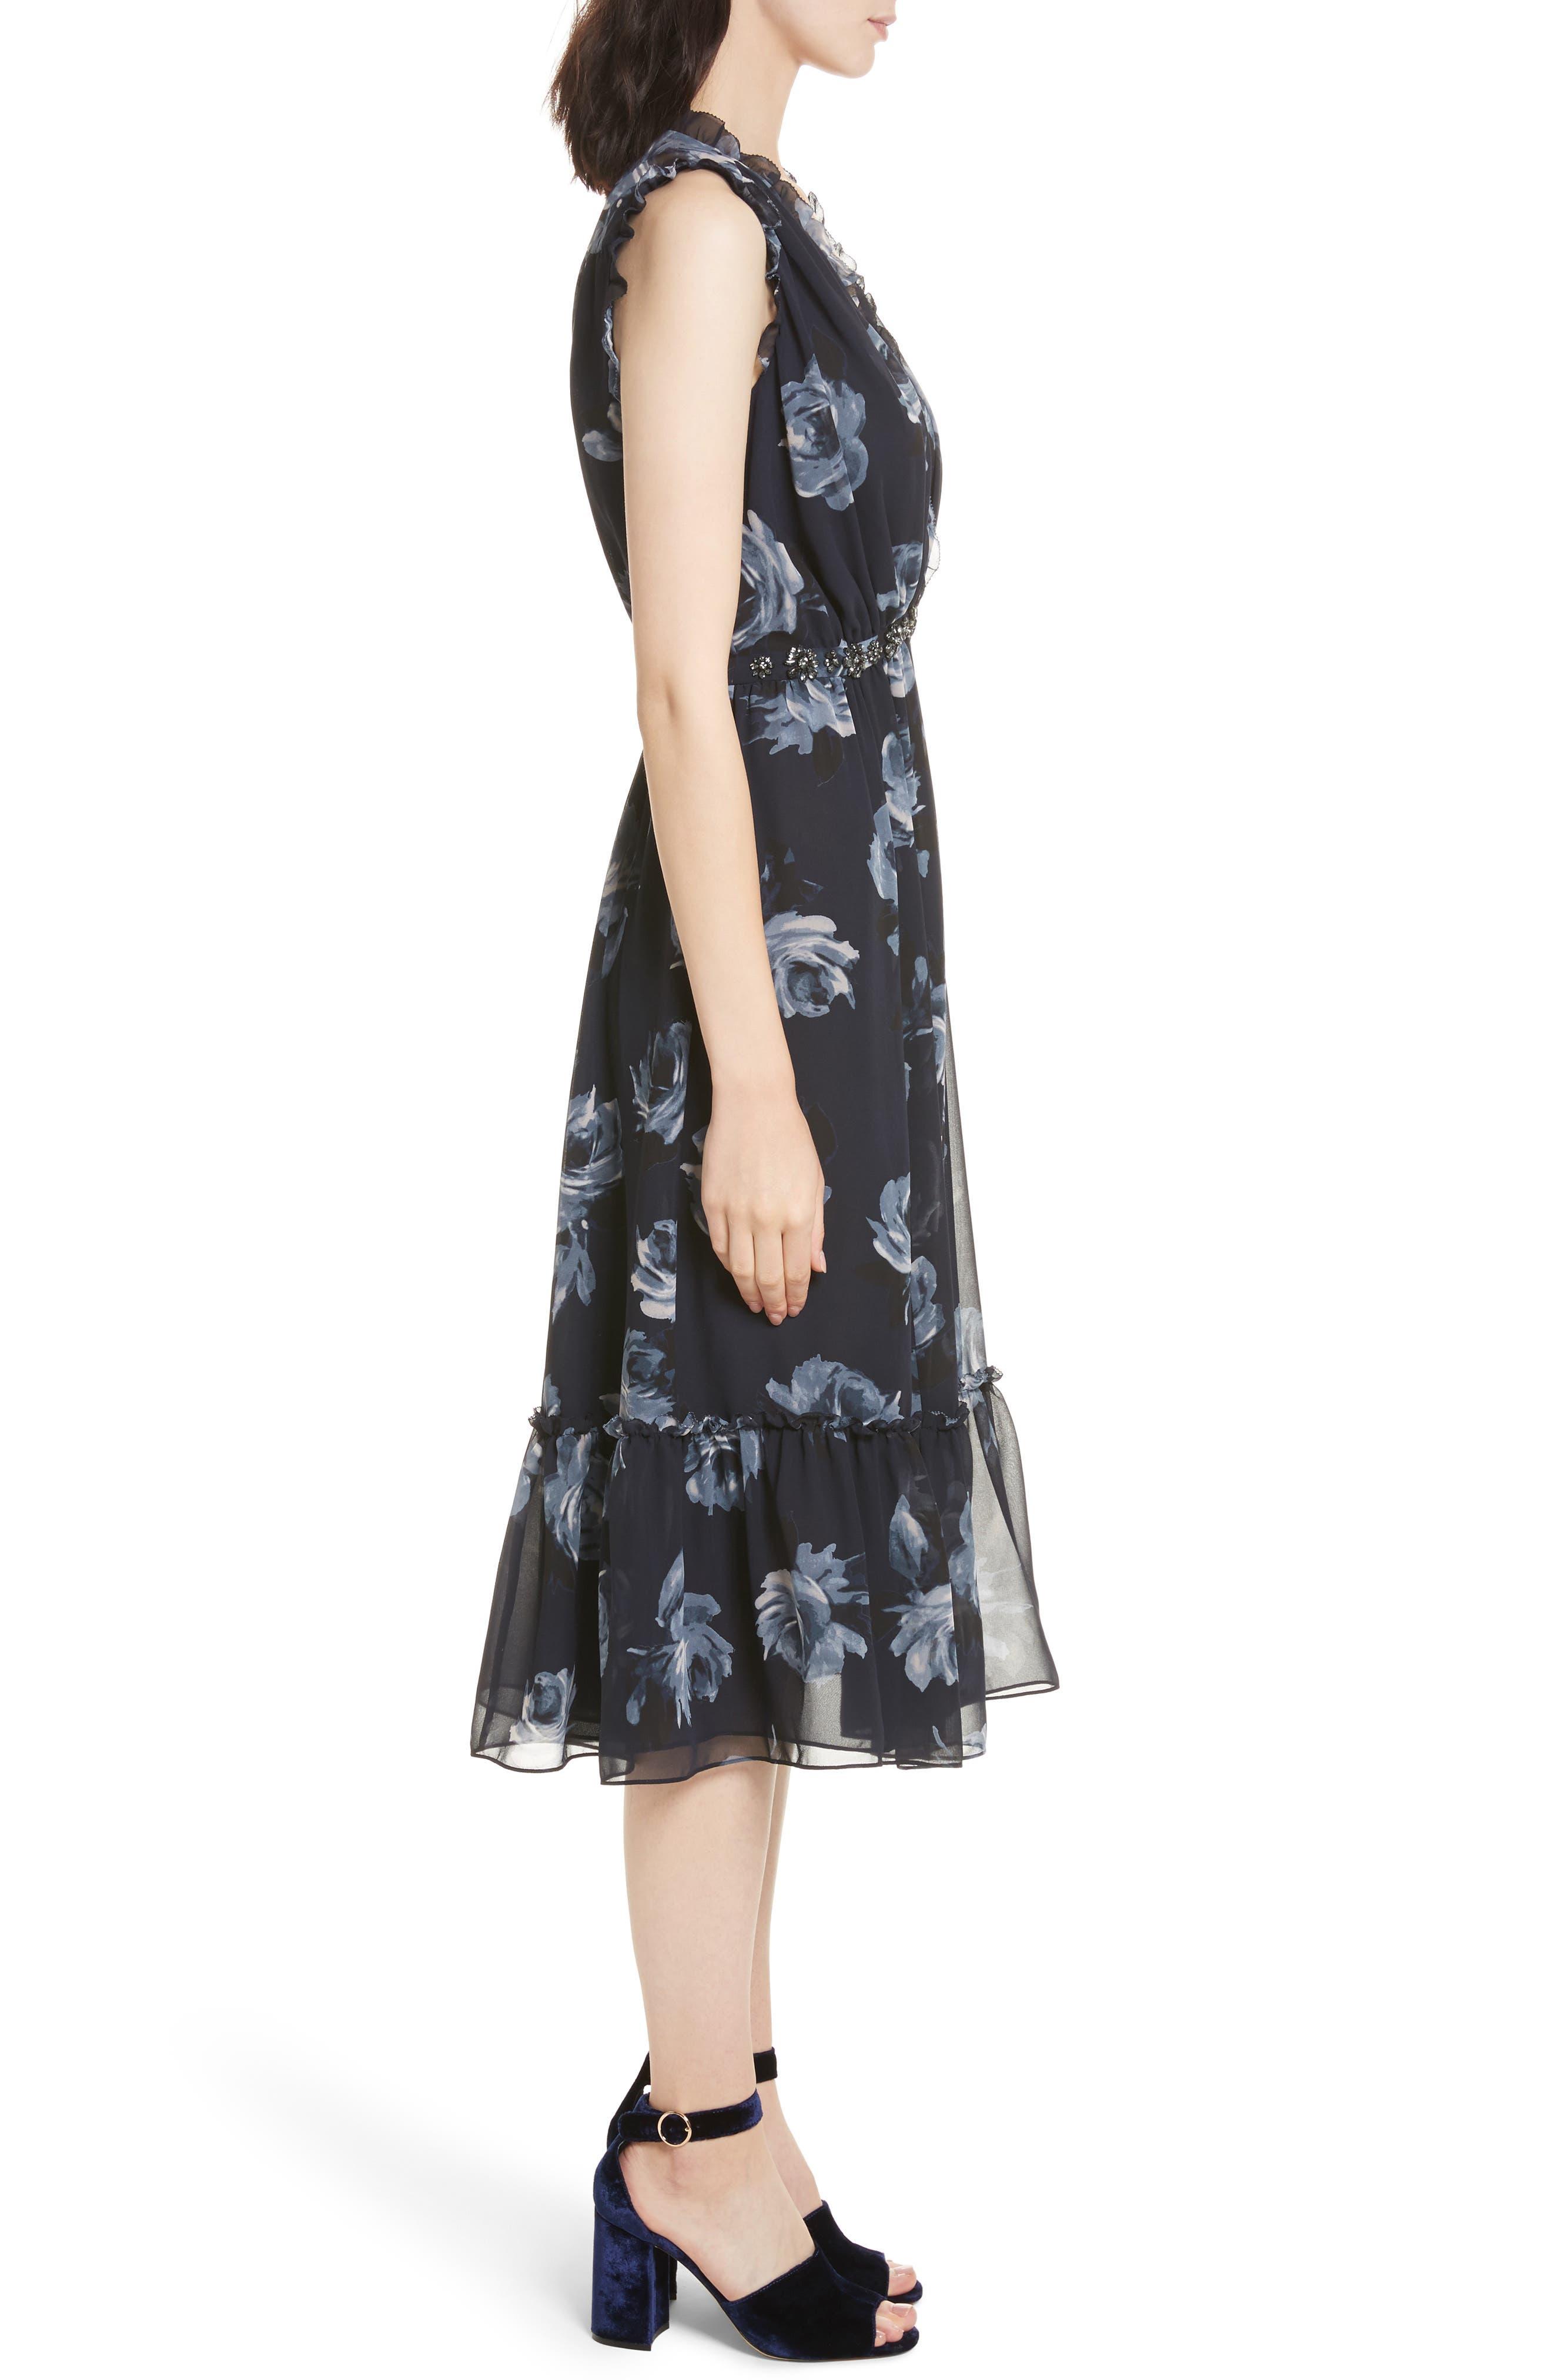 kade spade new york Night Rose Chiffon Midi Dress,                             Alternate thumbnail 3, color,                             Rich Navy